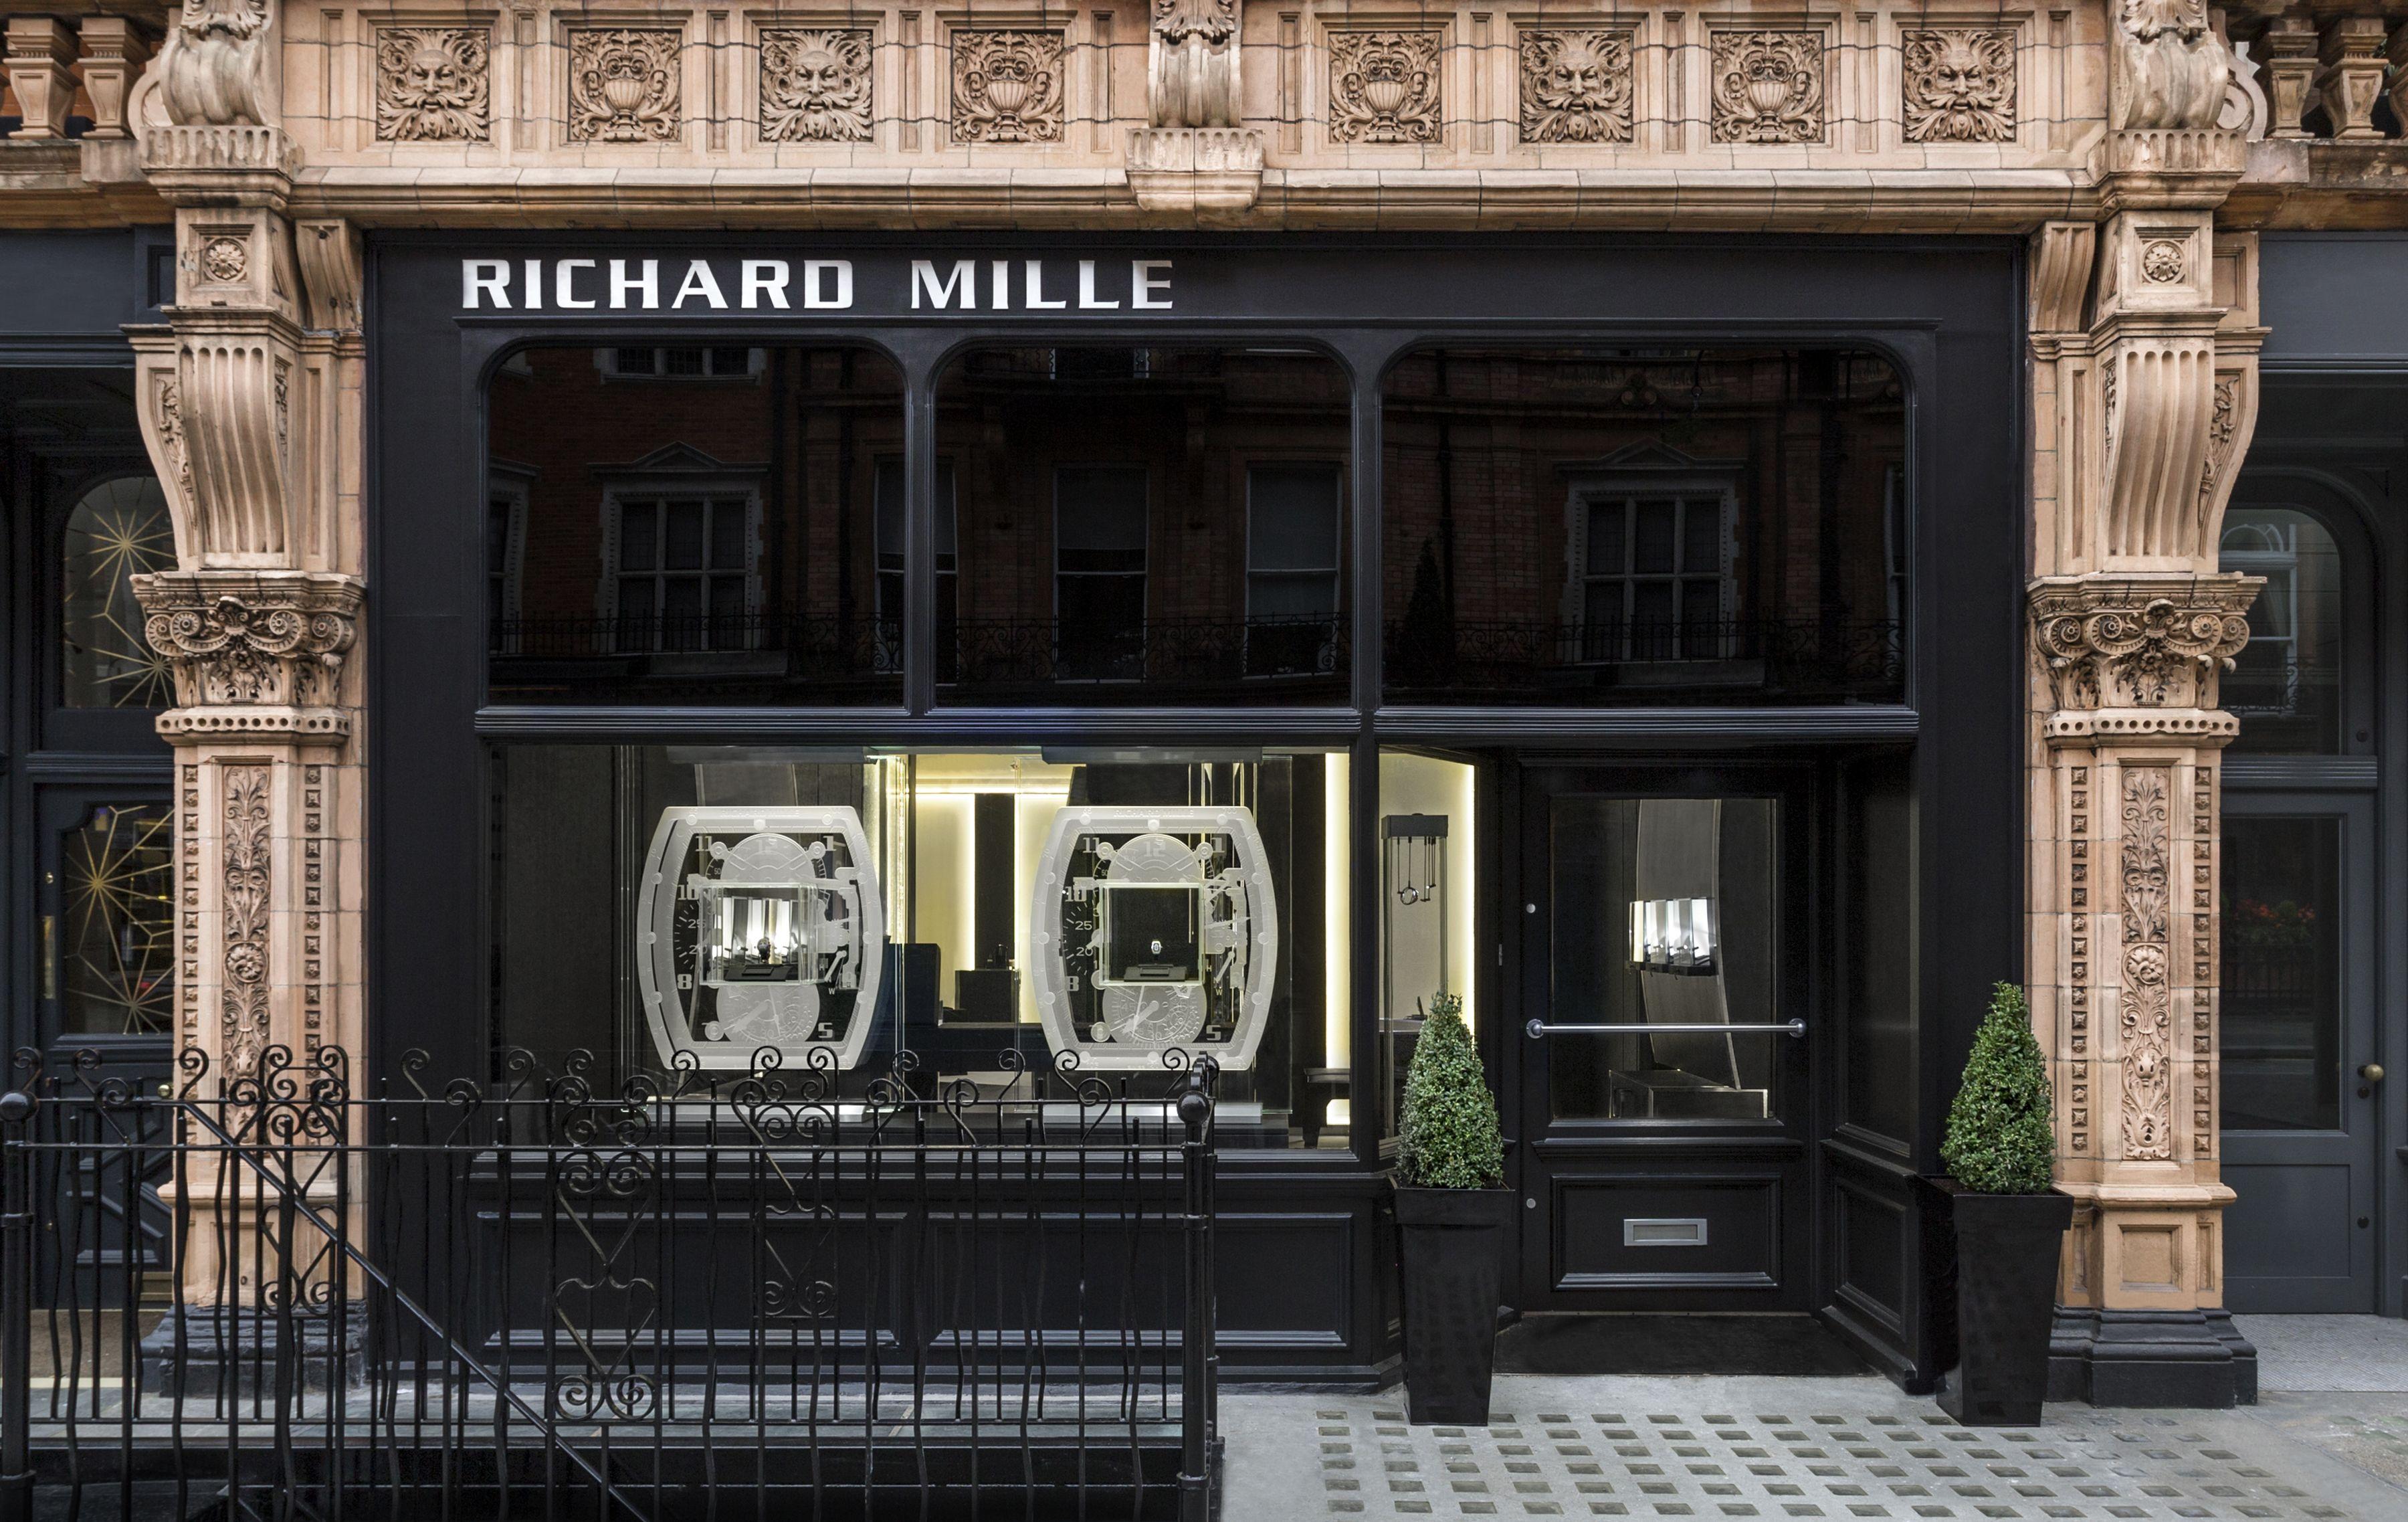 Richard Mille Boutique London at 90 Mount Street, Mayfair